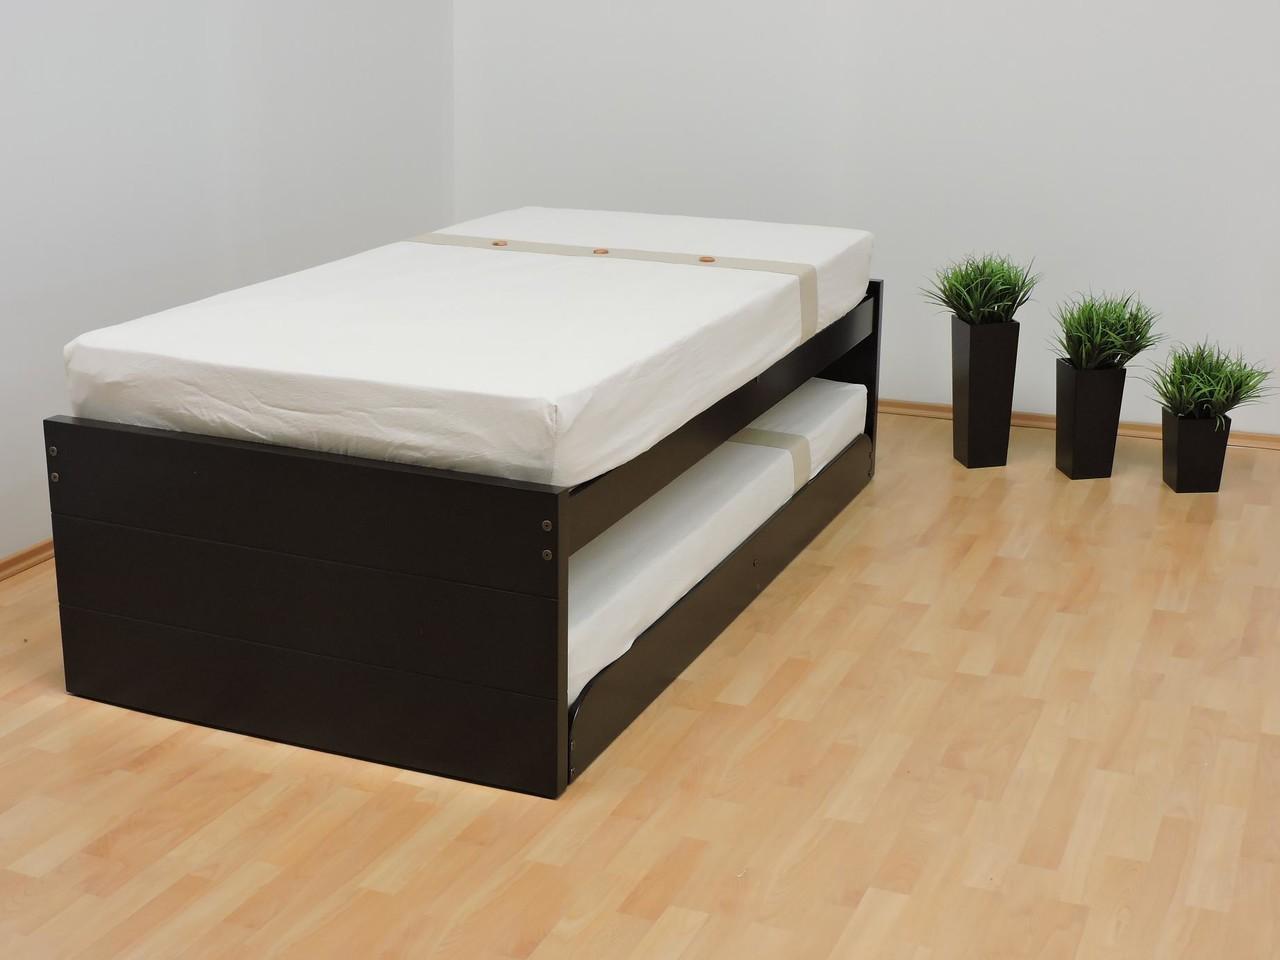 Bases dobles muebles gm muebles de madera for Cama individual que se hace doble